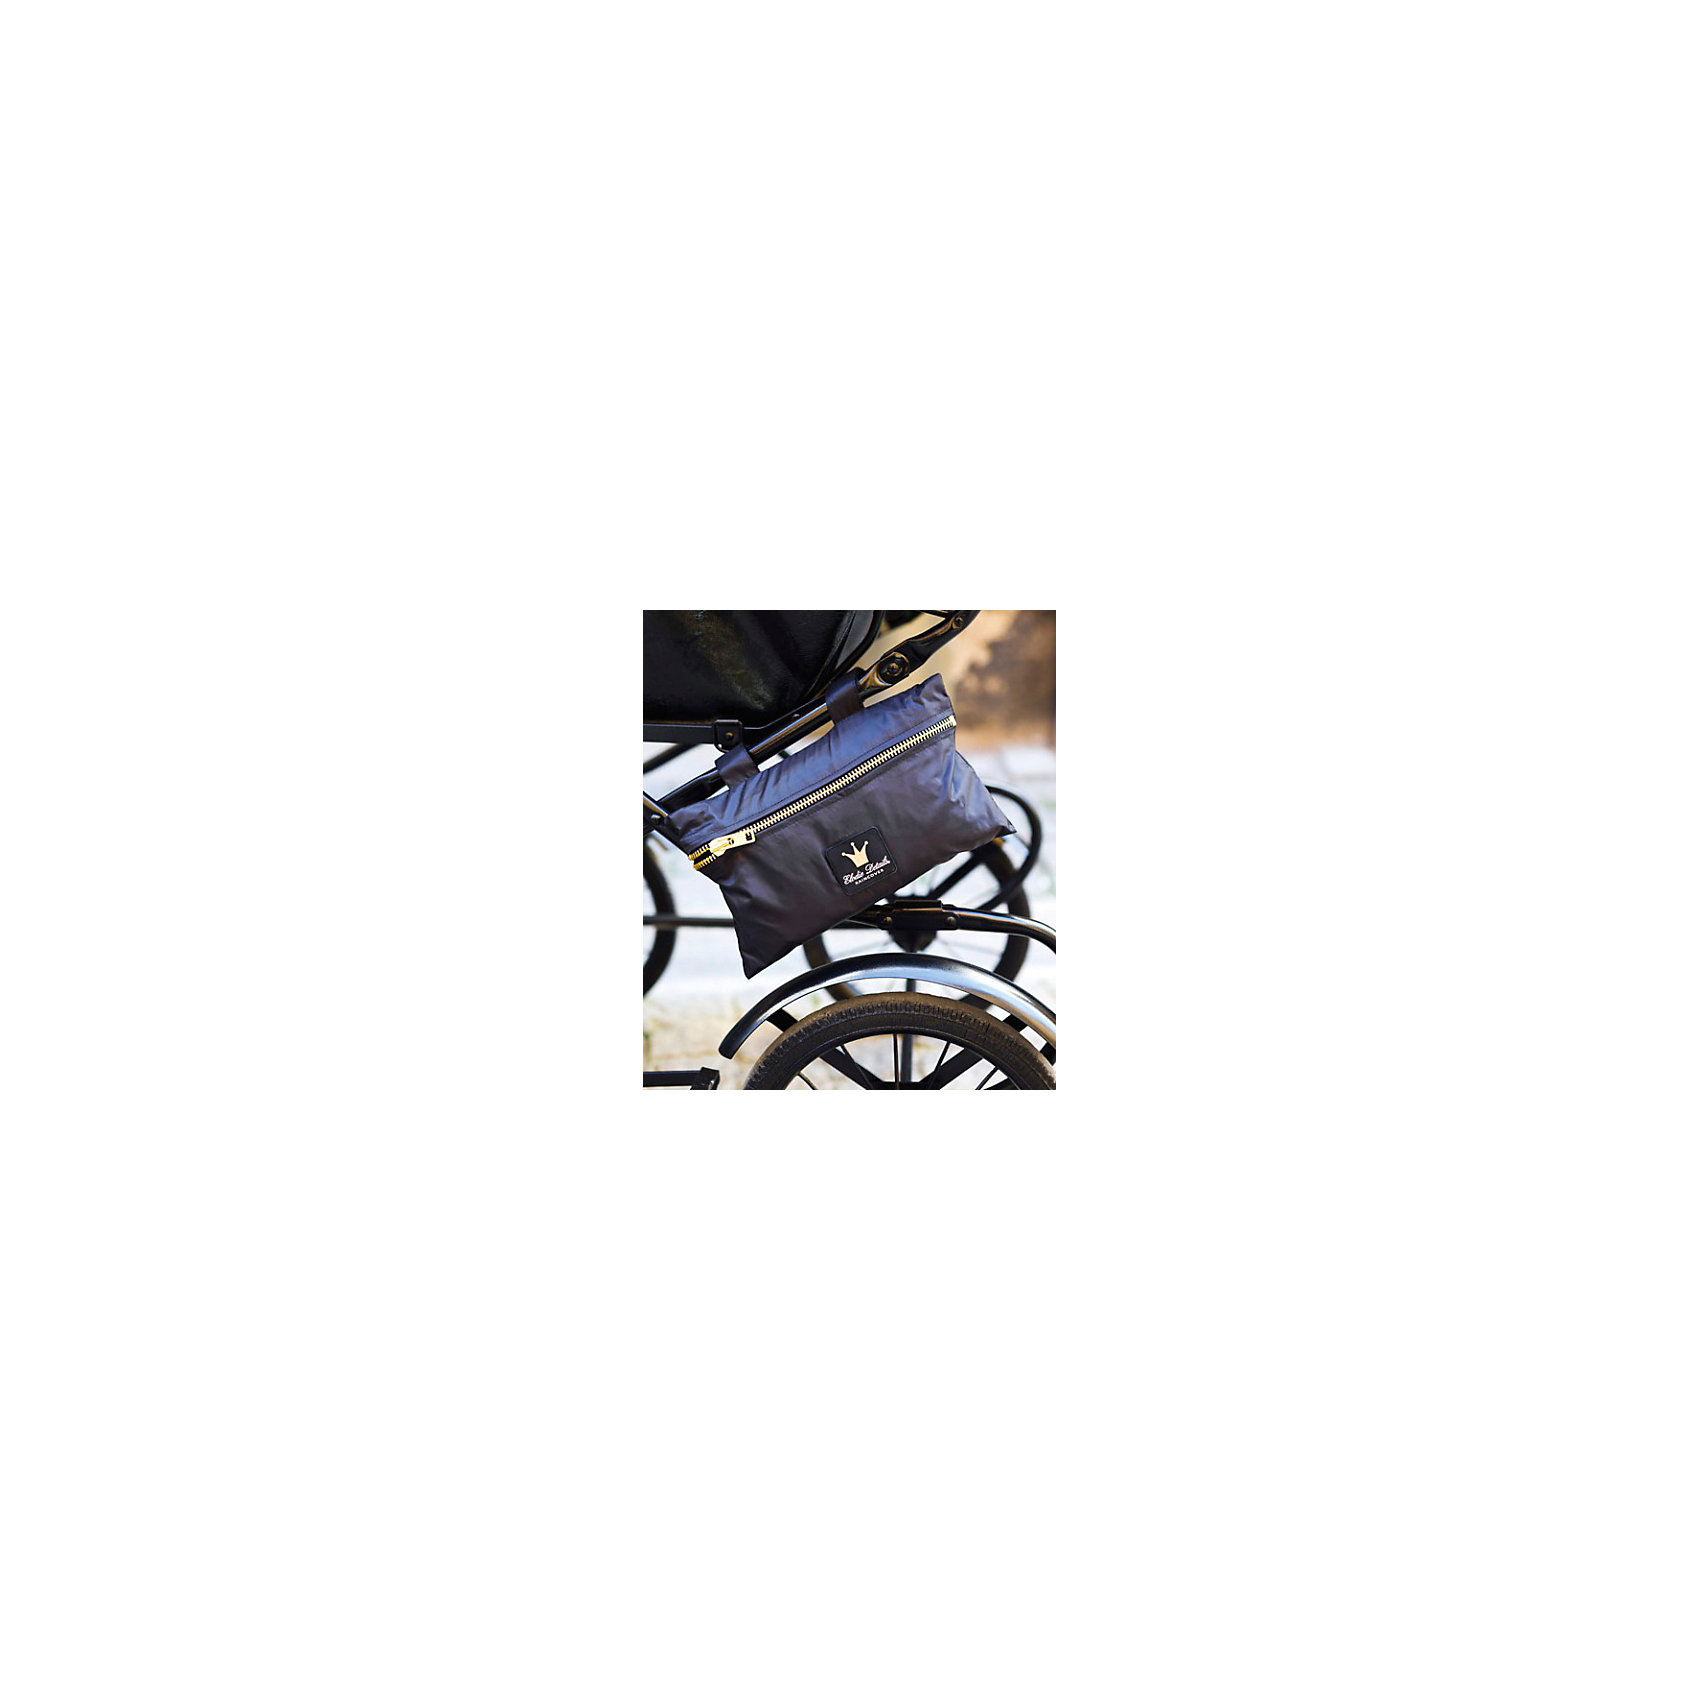 Дождевик для коляски цвет Black Edition, ELODIE DETAILS (Elodie Details)